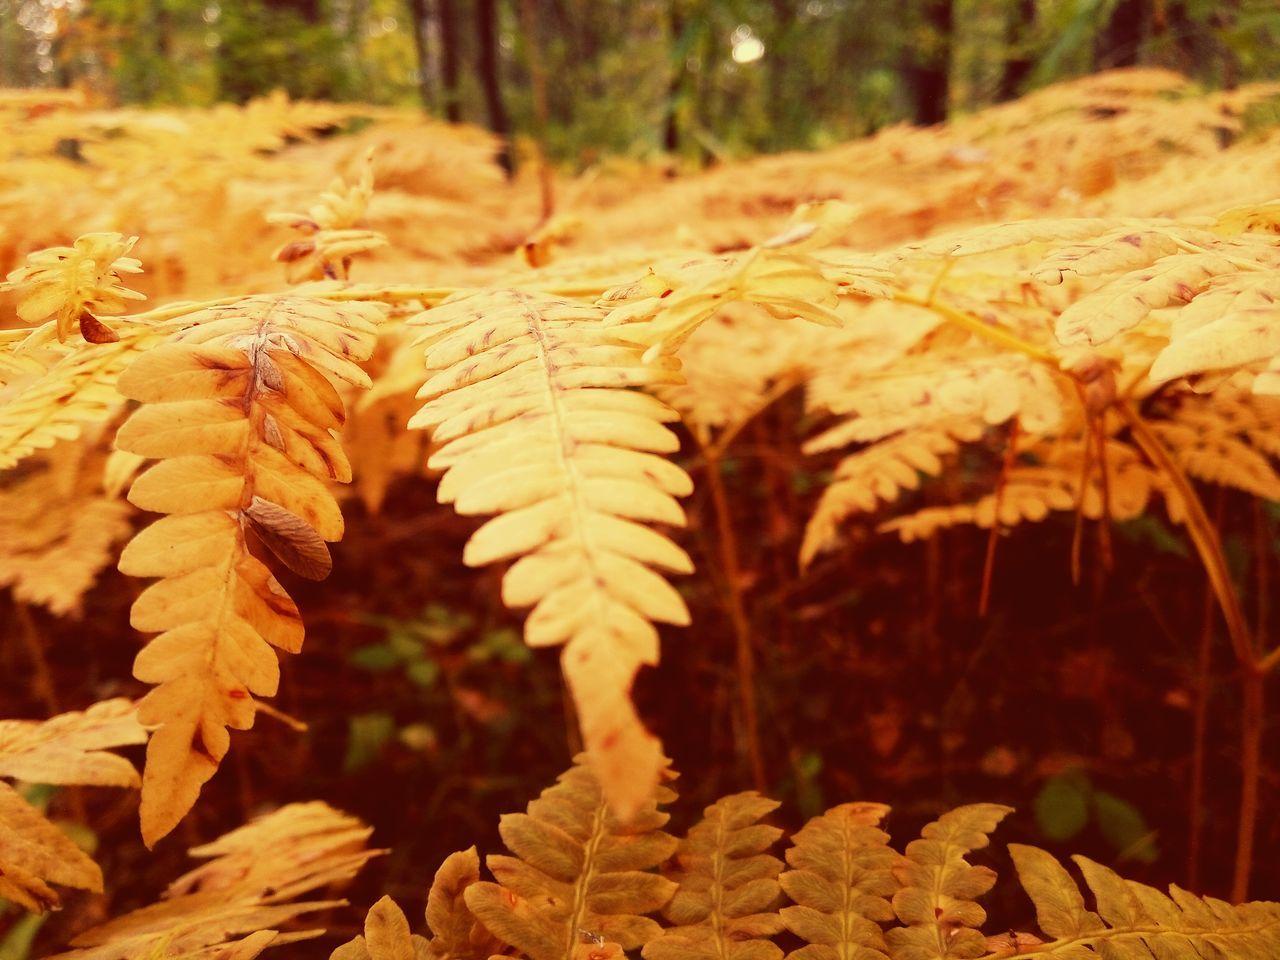 Nature Day папоротник Осень 🍁🍂 осень прекрасна 🌾🍂🍃 золото Gold Colored Goodday